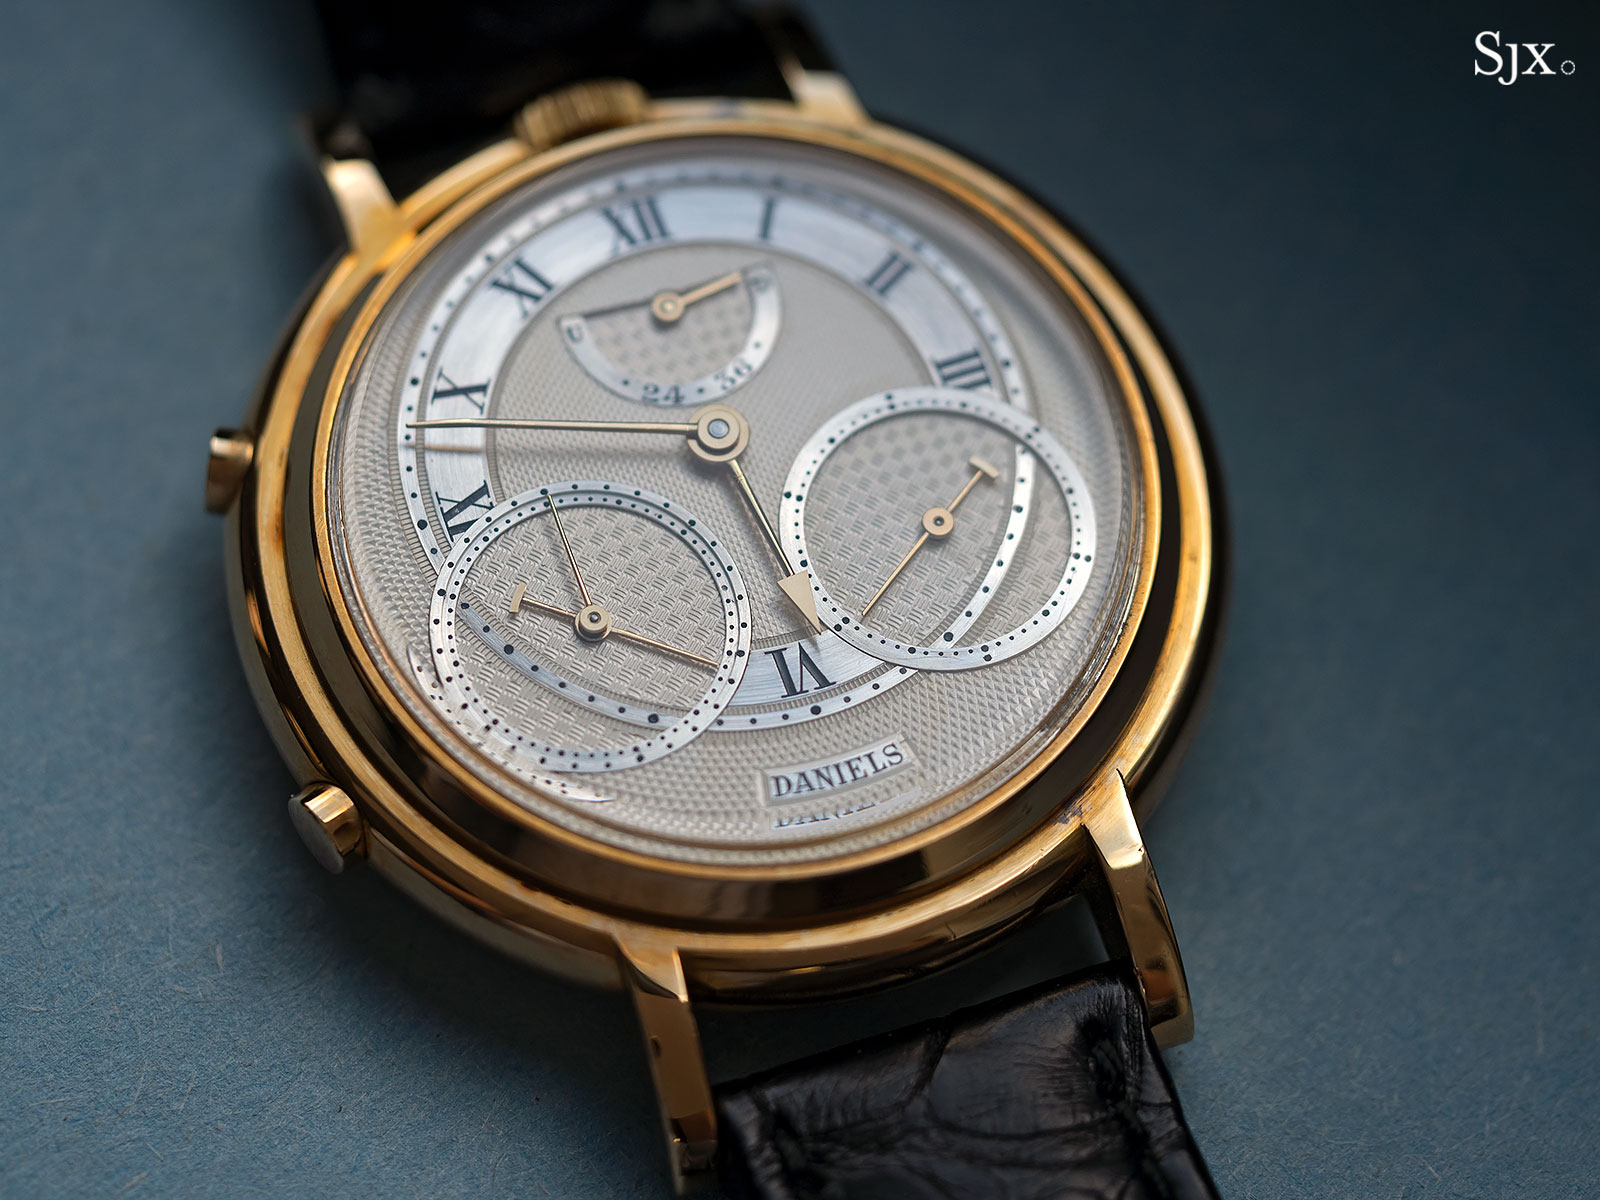 George Daniels Chronograph Wristwatch with tourbillon 1